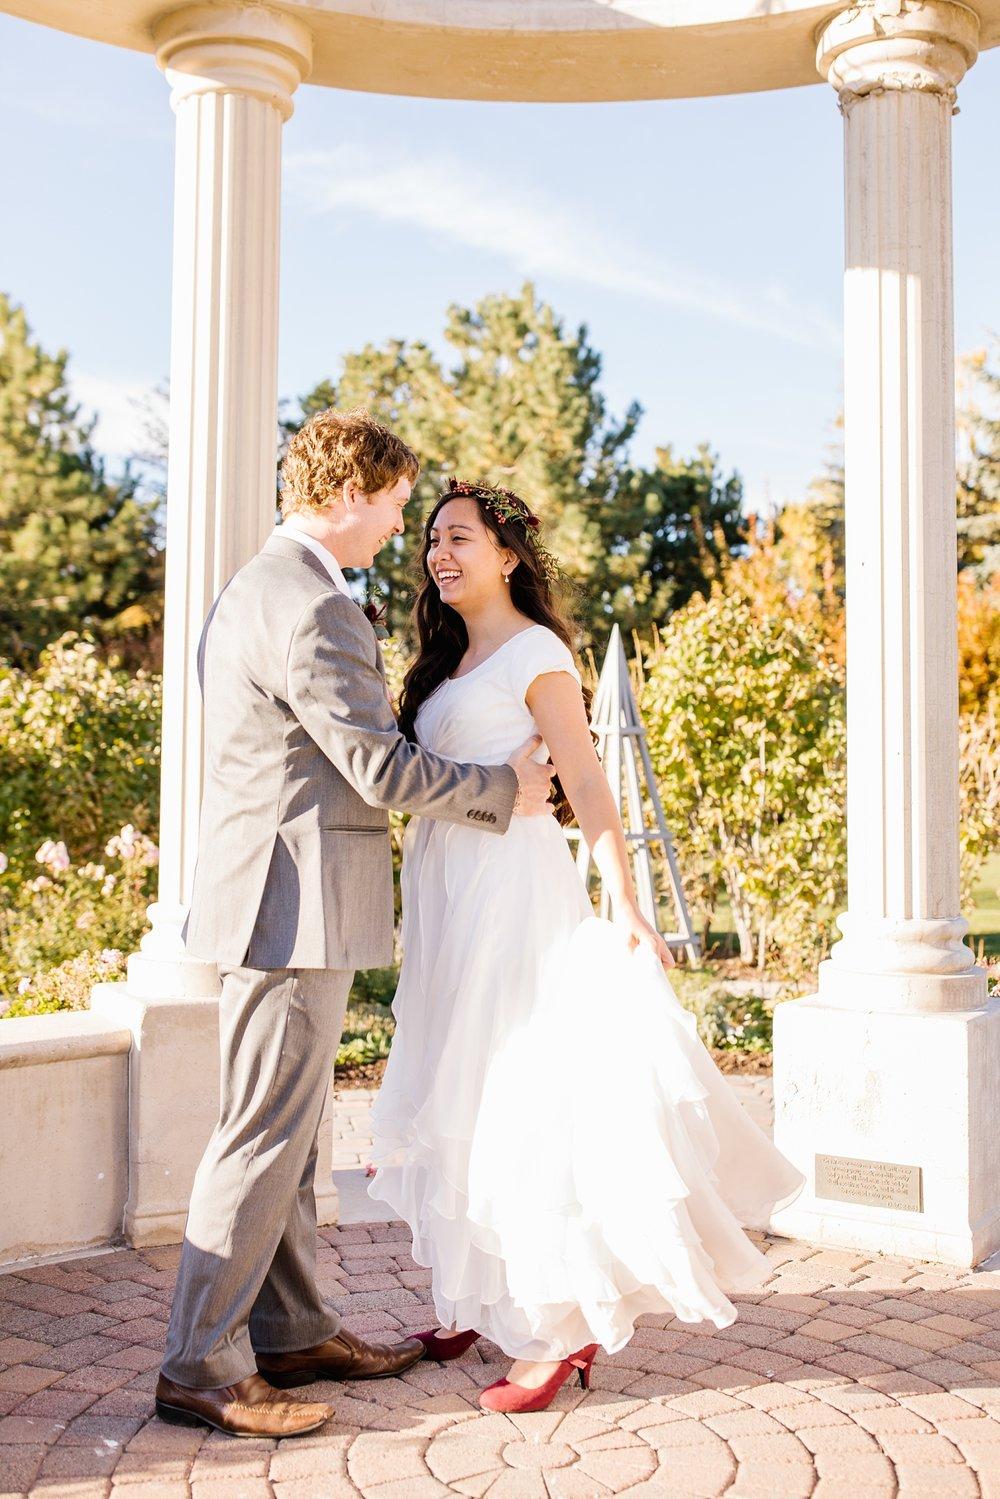 JB-Bridals-64_Lizzie-B-Imagery-Utah-Wedding-Photographer-Thanksgiving-Point-Ashton-Gardens-Lehi-Utah.jpg